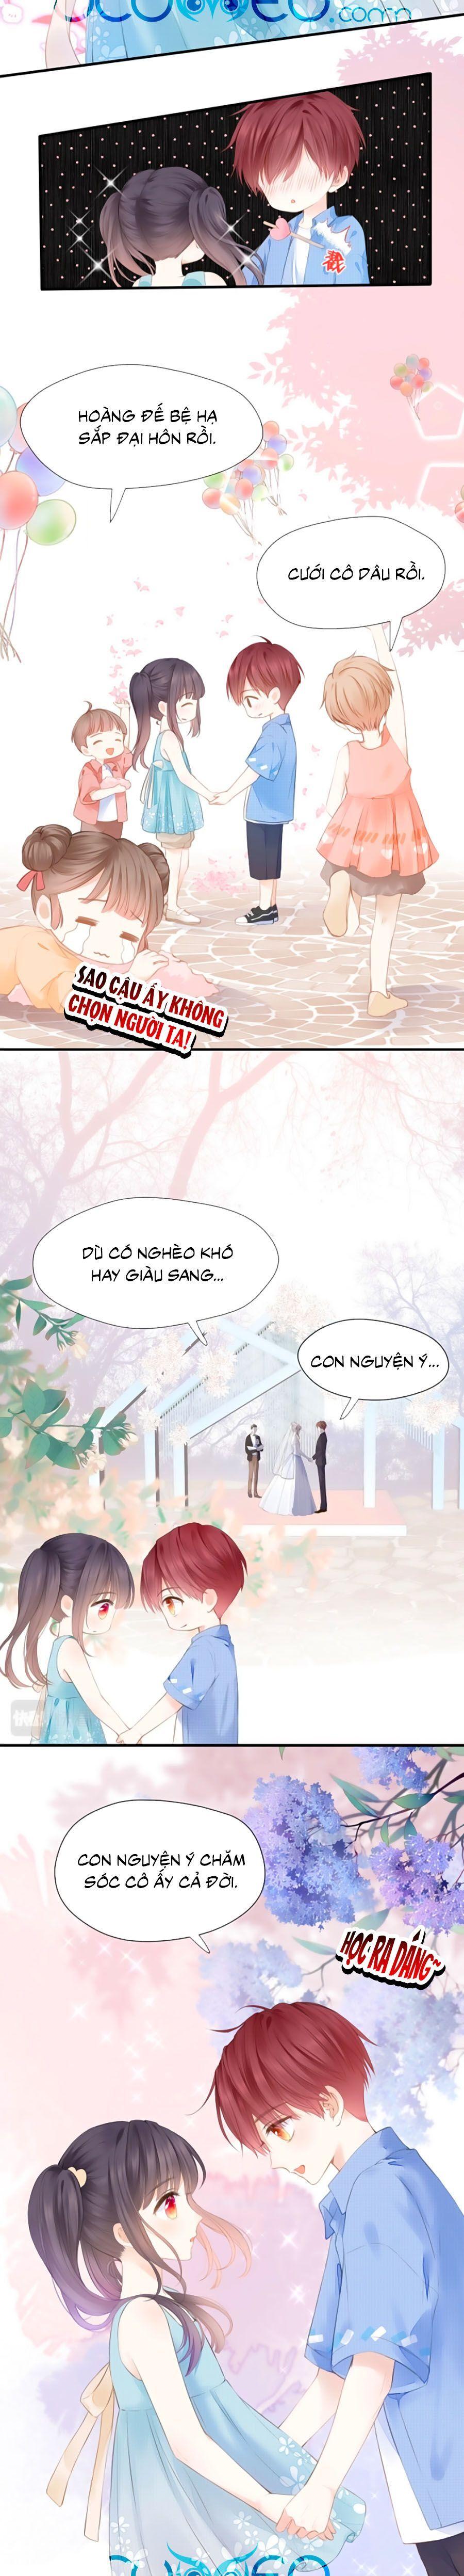 Thầm Yêu: Quất Sinh Hoài Nam Chap 1 . Next Chap Chap 2